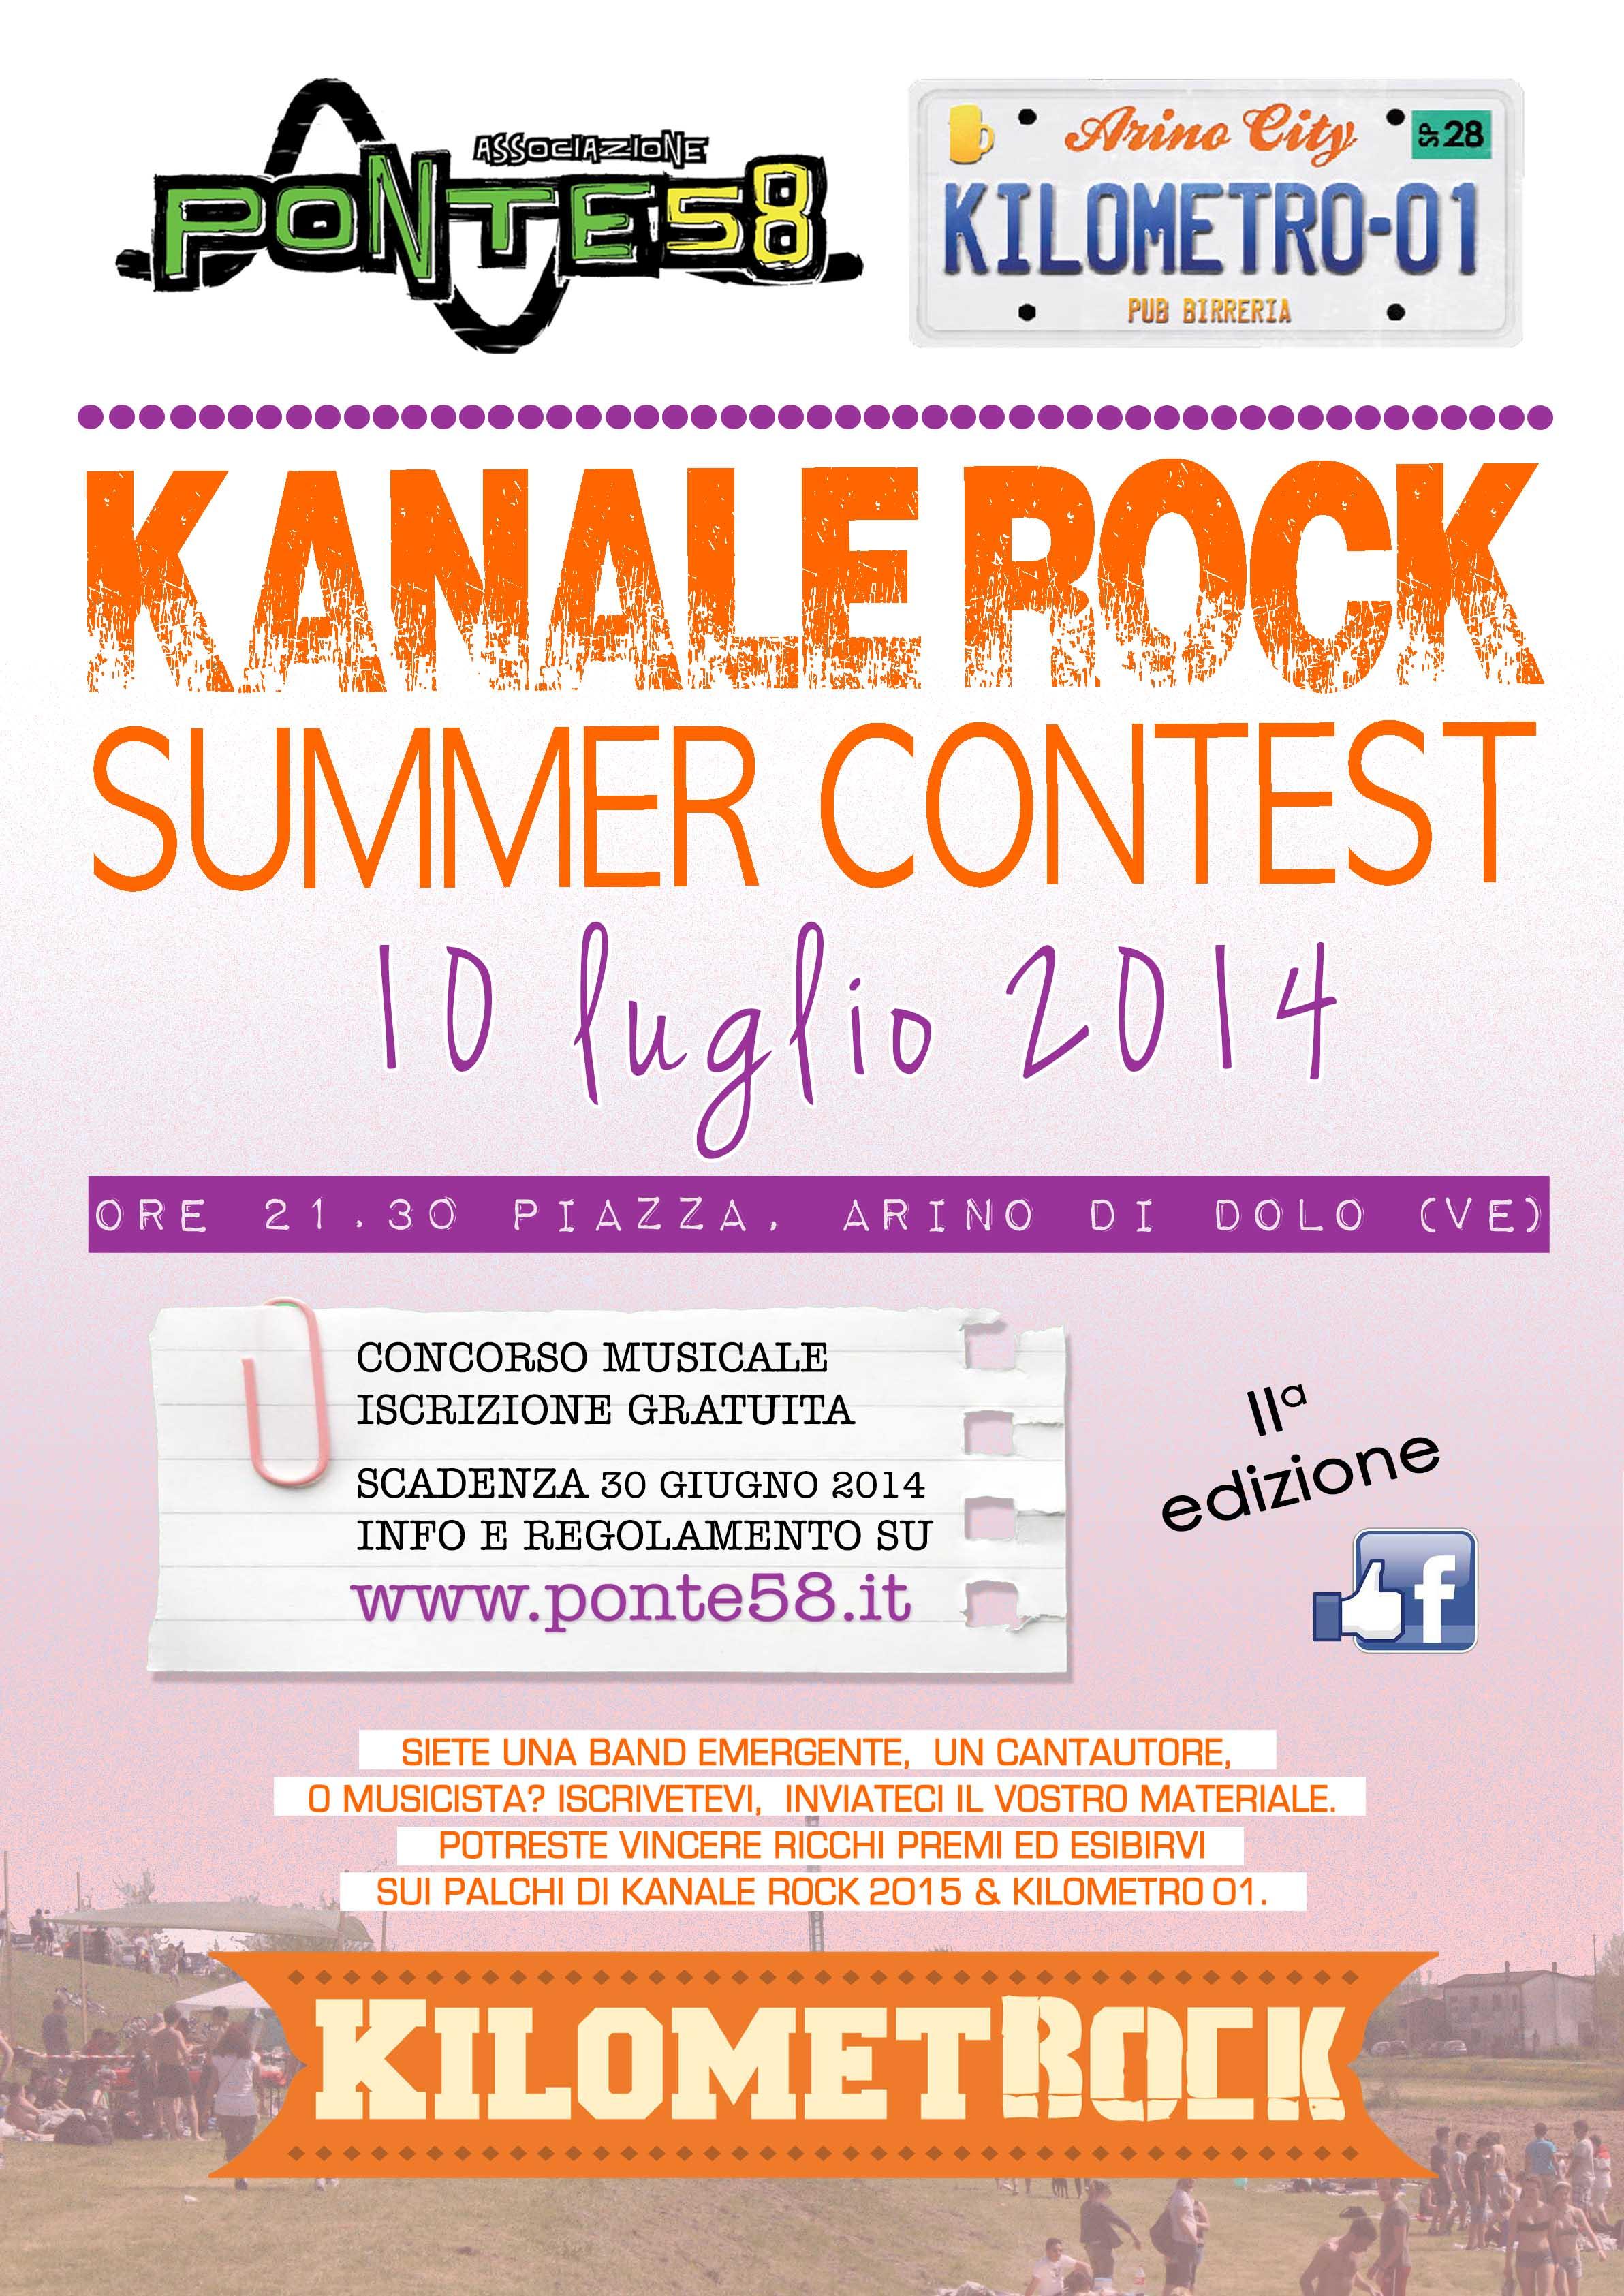 KanaleRockSummerContest2014